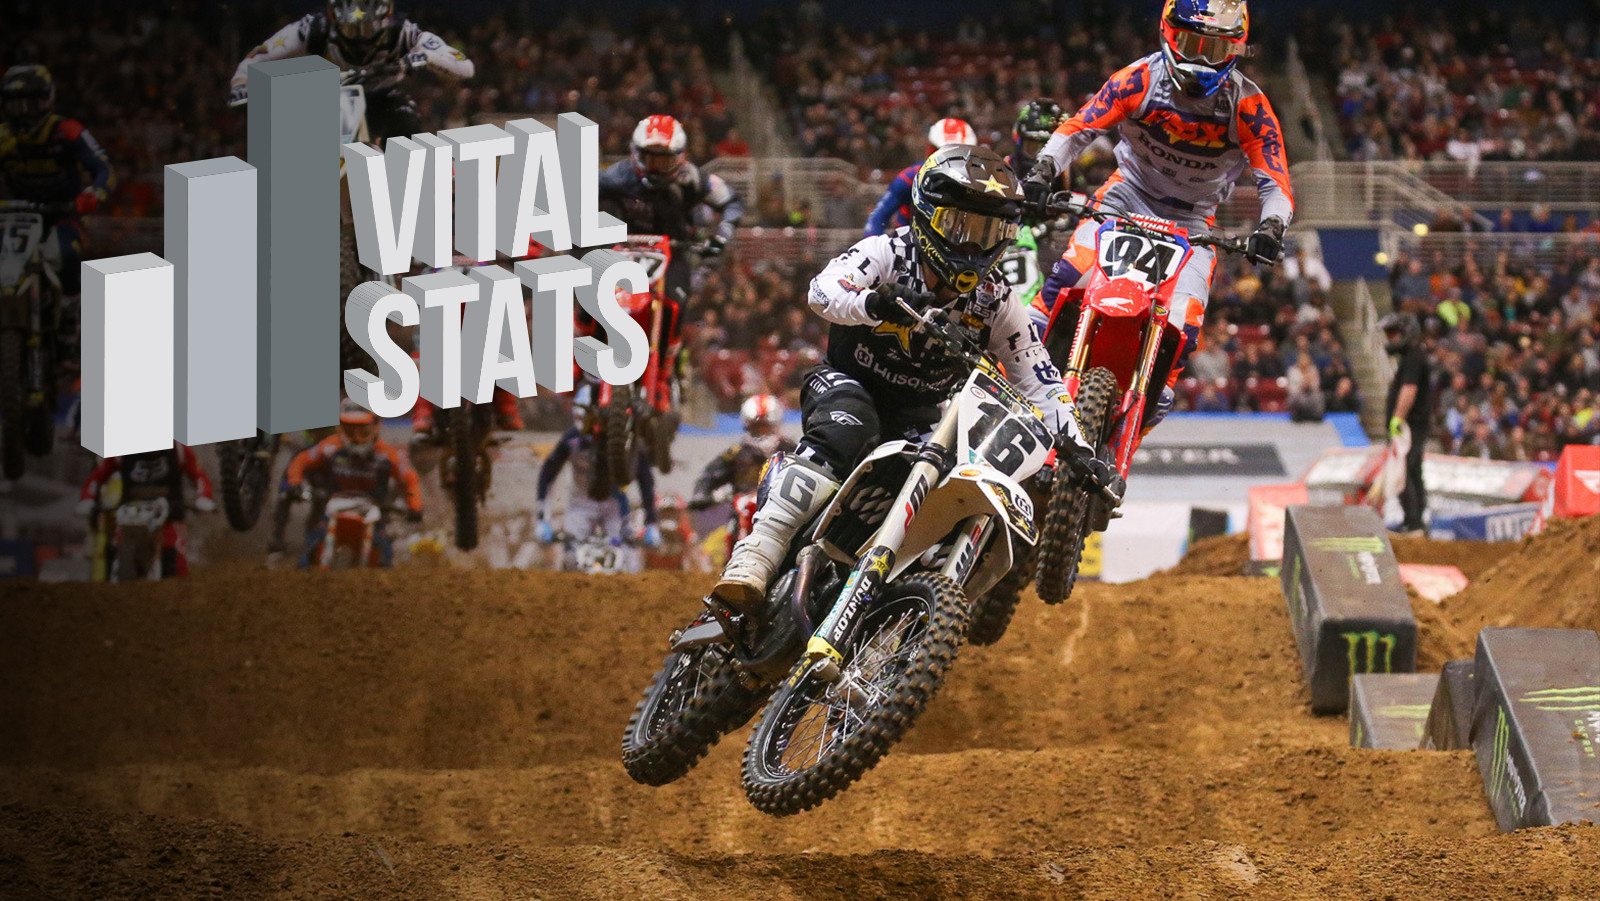 Vital Stats: 2020 Supercross Championship, Week 2